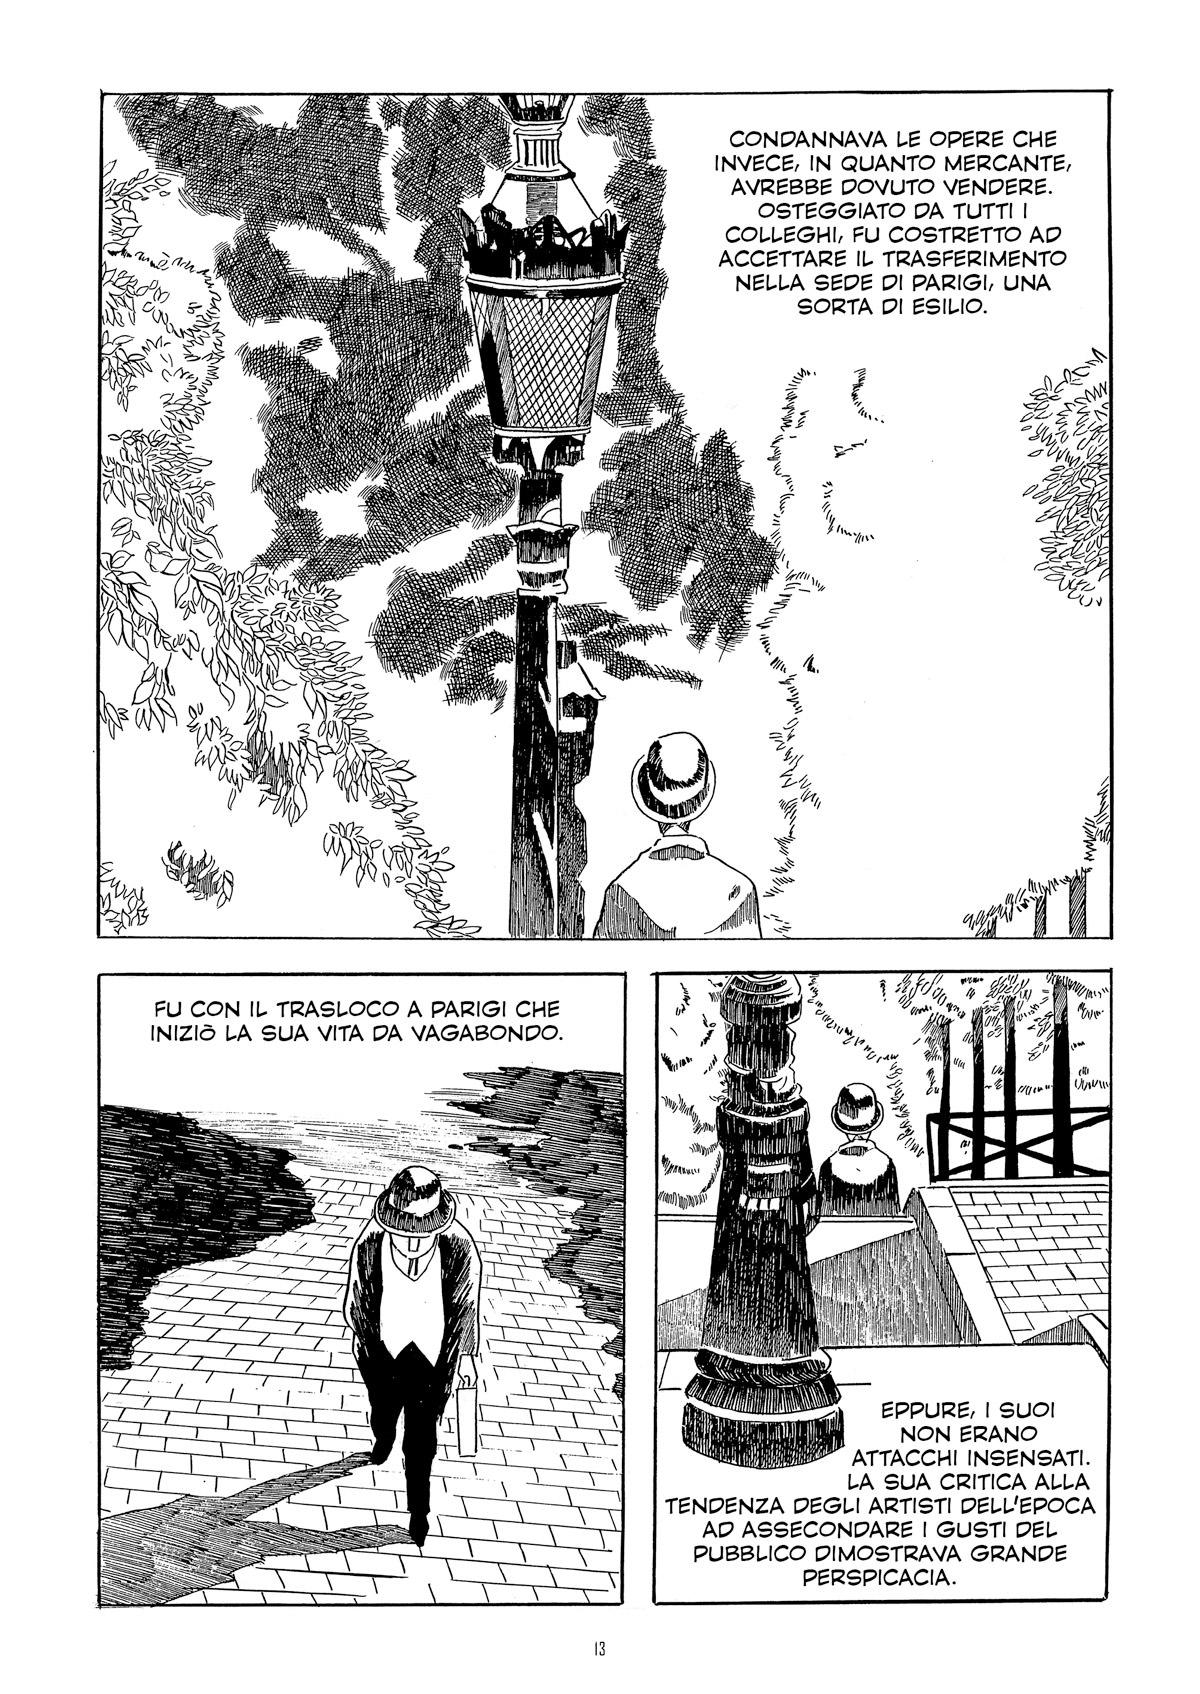 Tsuge Tadao Trash Market Kuzu No Ichi 1972 As Published In Drawn Quarterly 2016